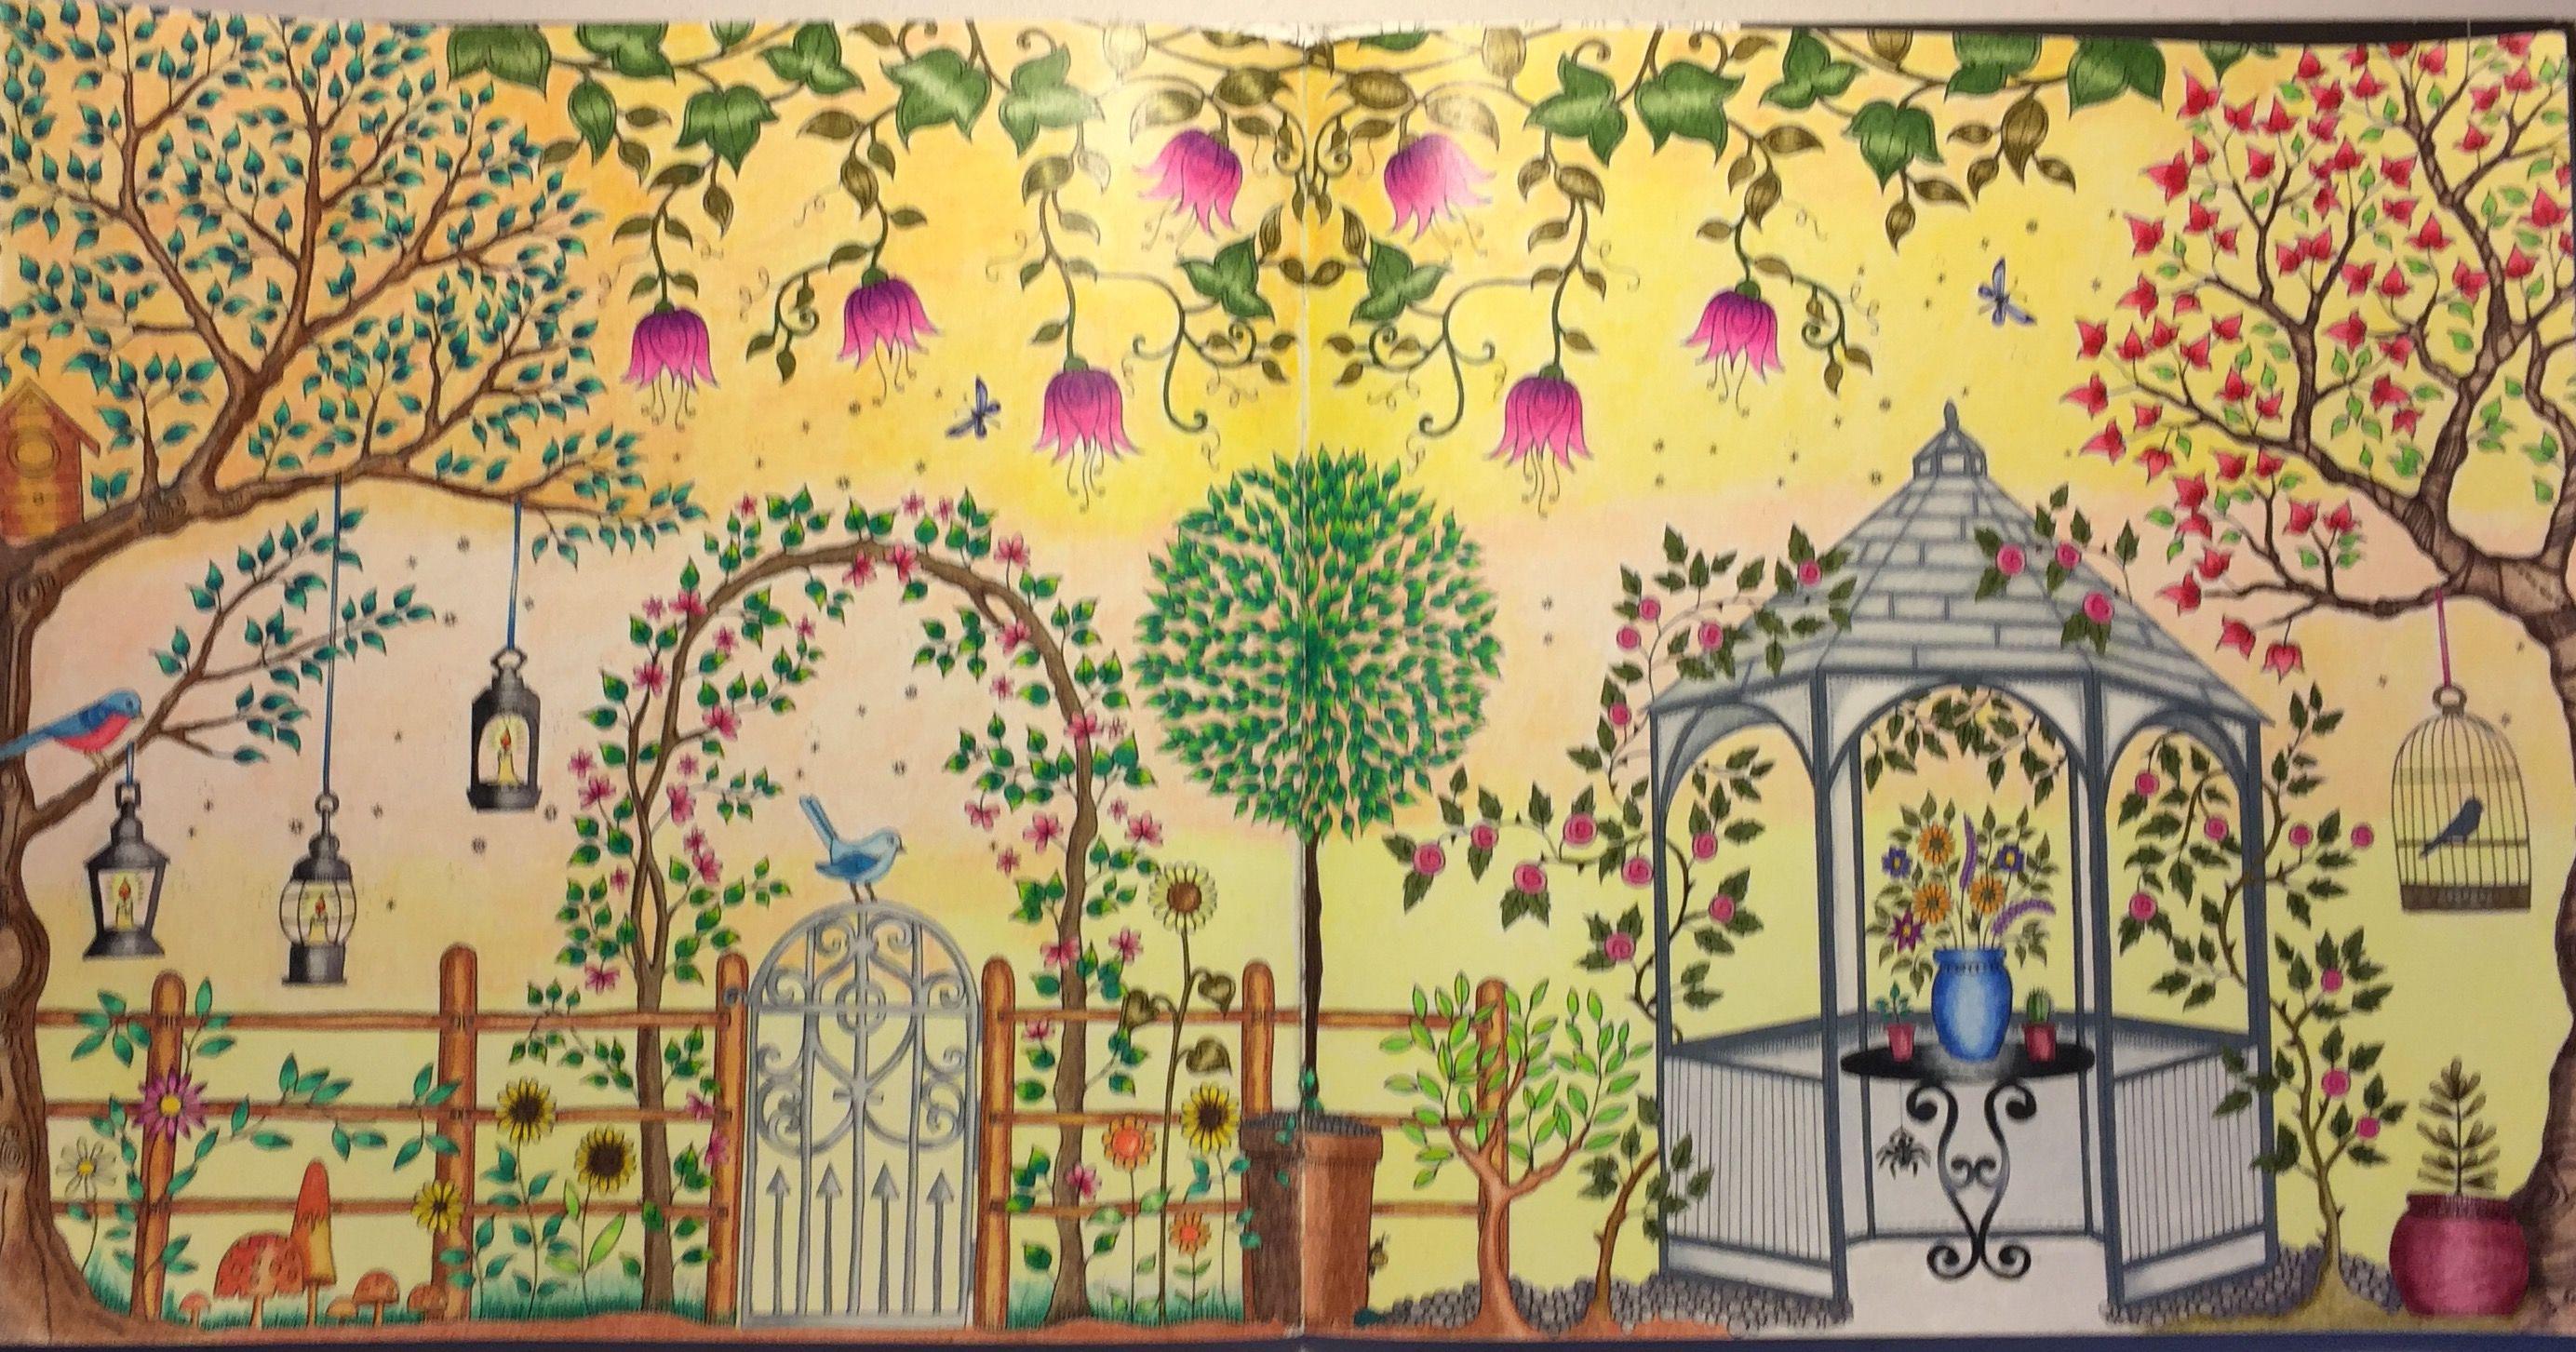 From Secret Garden By Johanna Bradford Completed 3 5 17 Secret Garden Coloring Book Secret Garden Colouring Johanna Basford Secret Garden